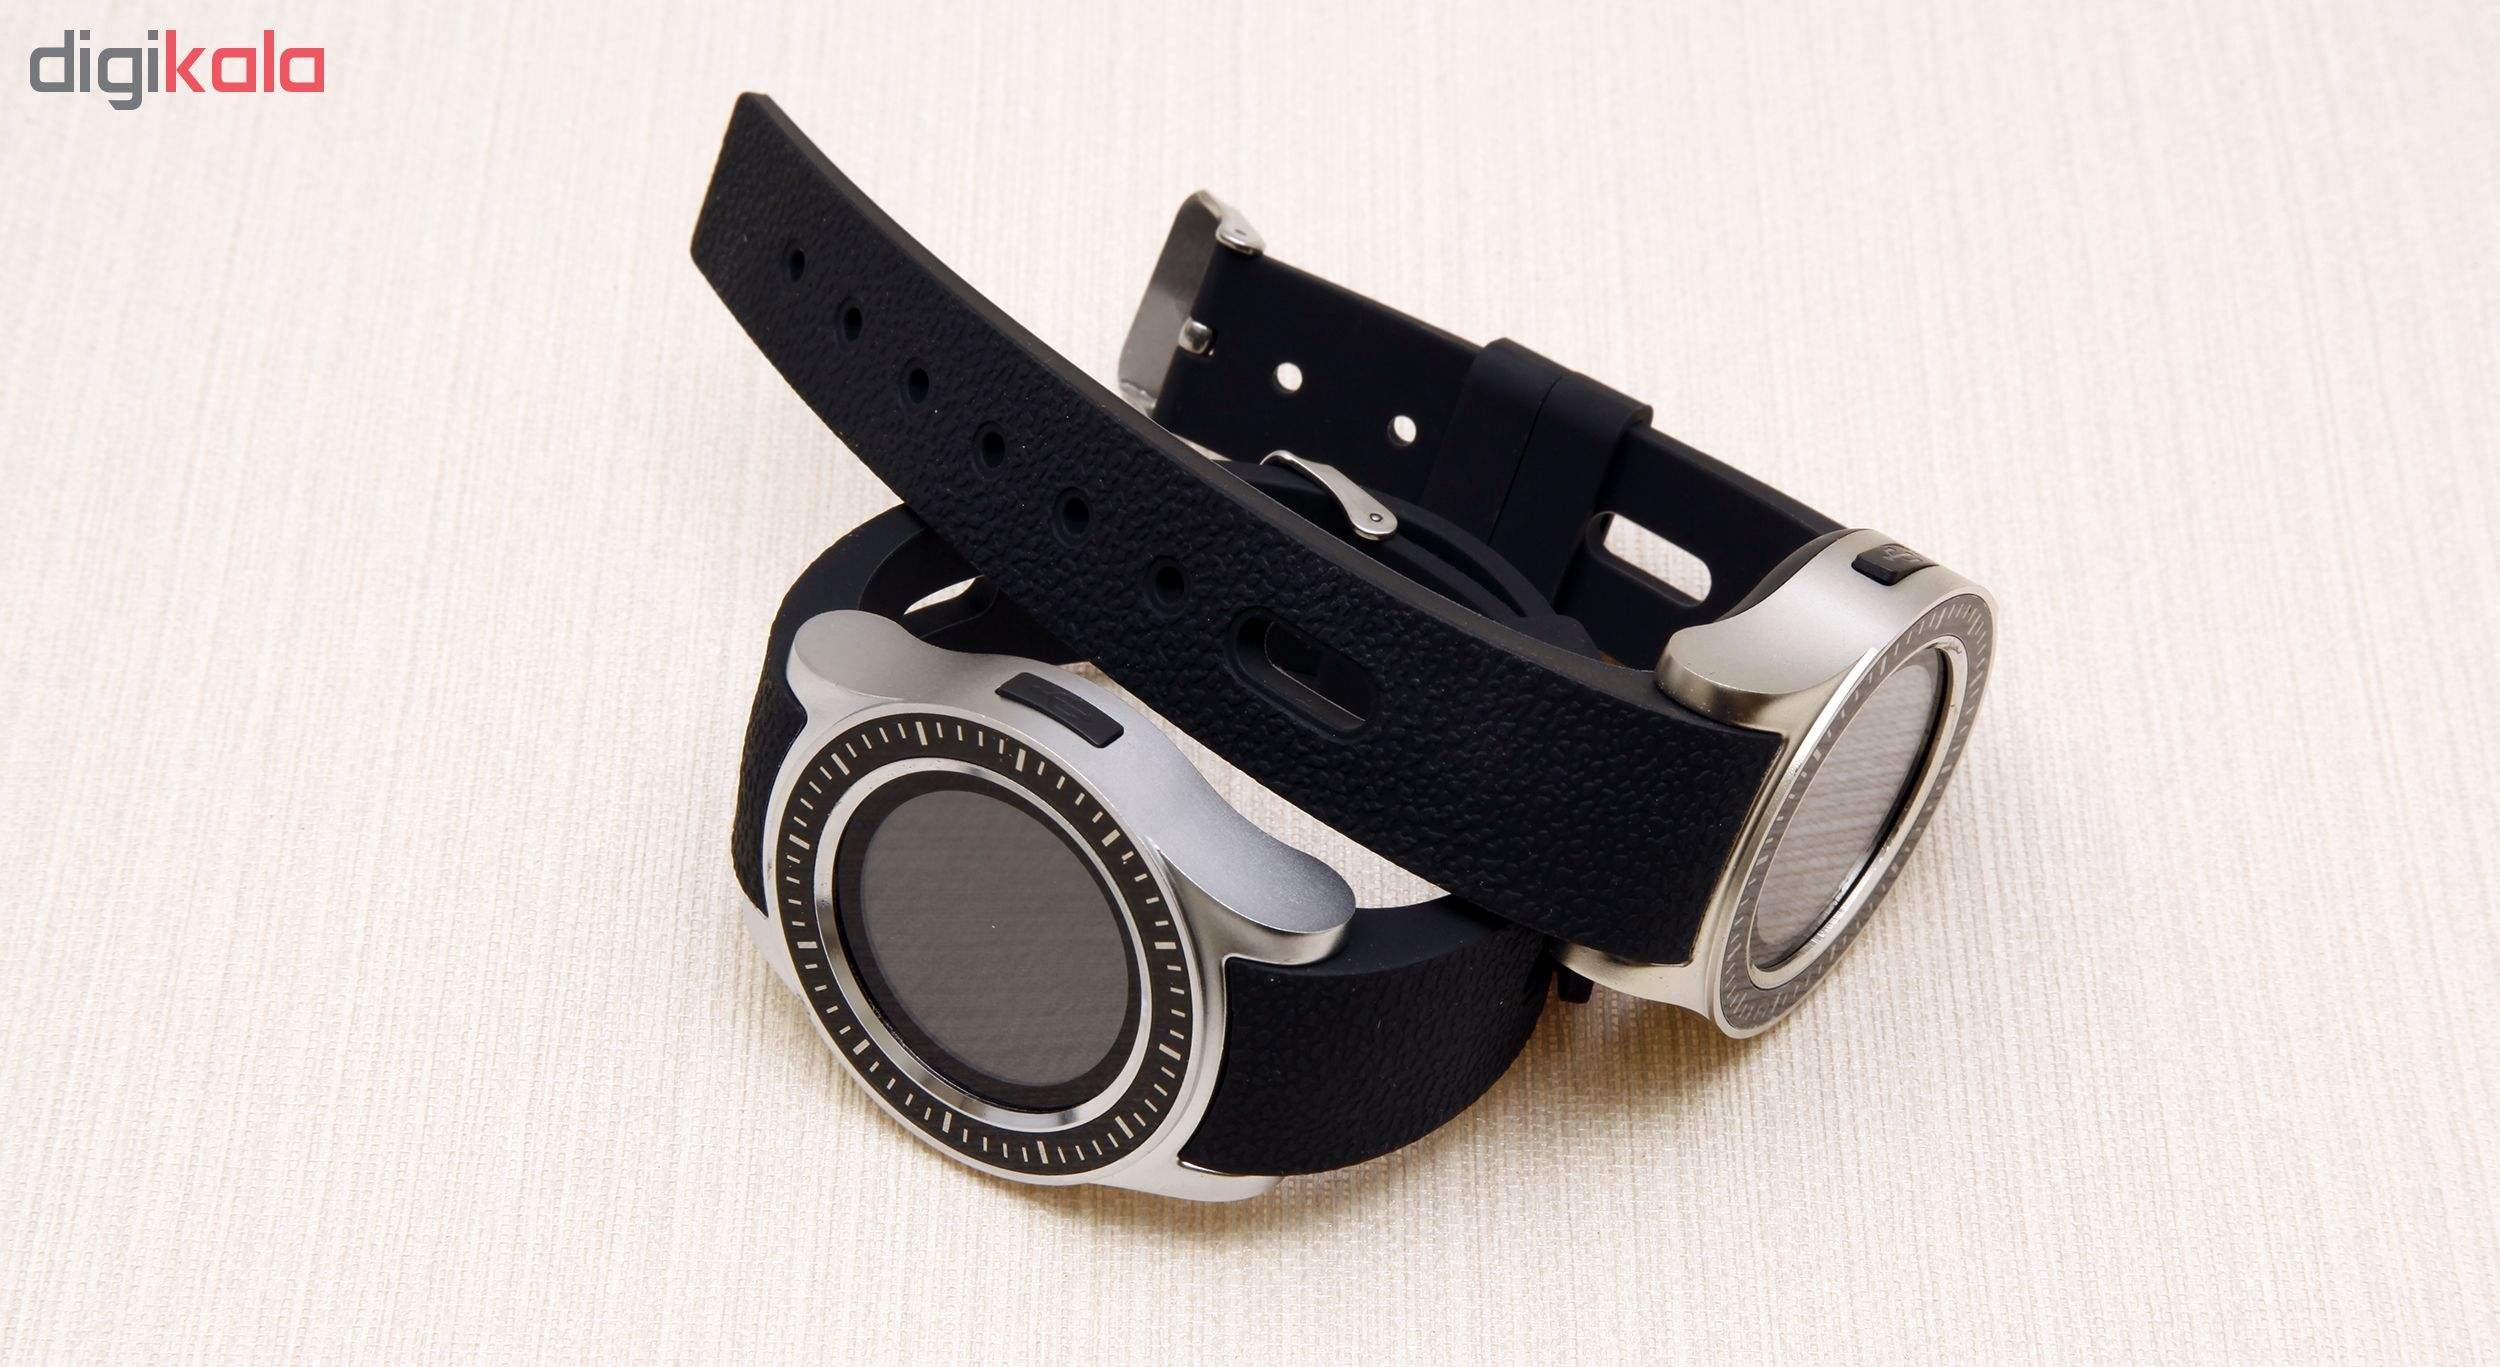 ساعت هوشمند جی تب مدل S1 main 1 2